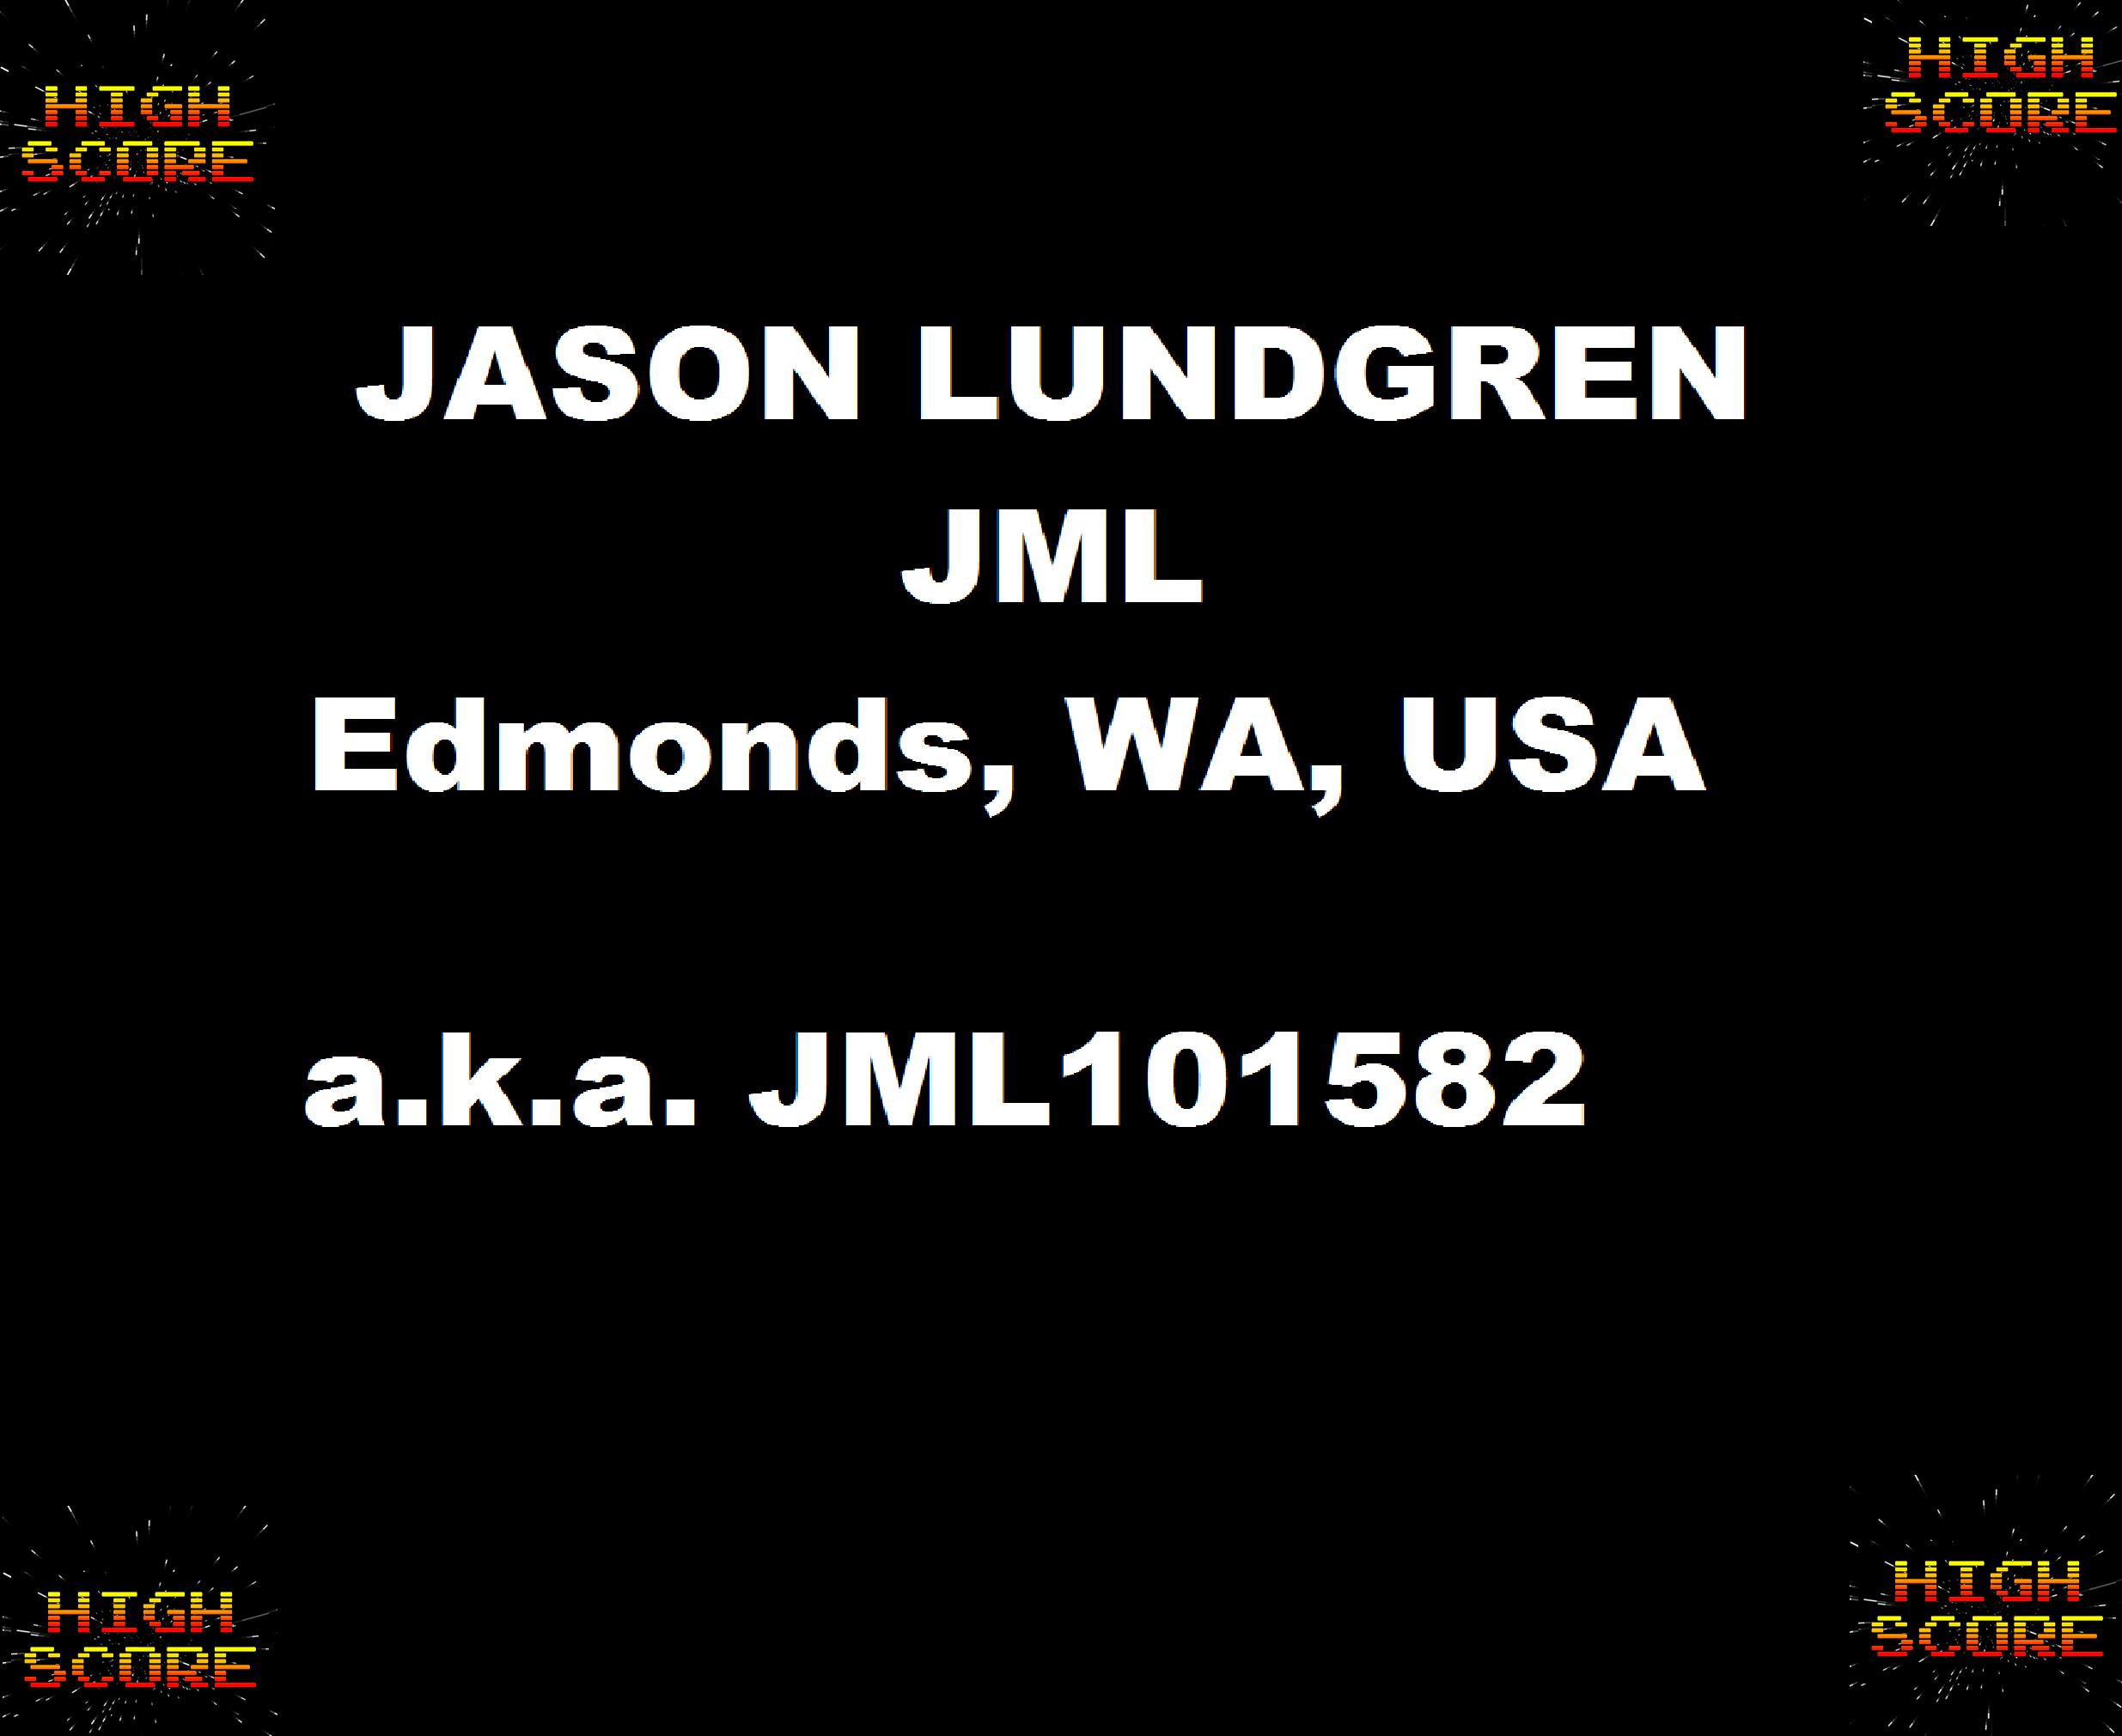 JML101582: New Tetris: Sprint Lines (N64) 2 points on 2019-06-15 17:36:40